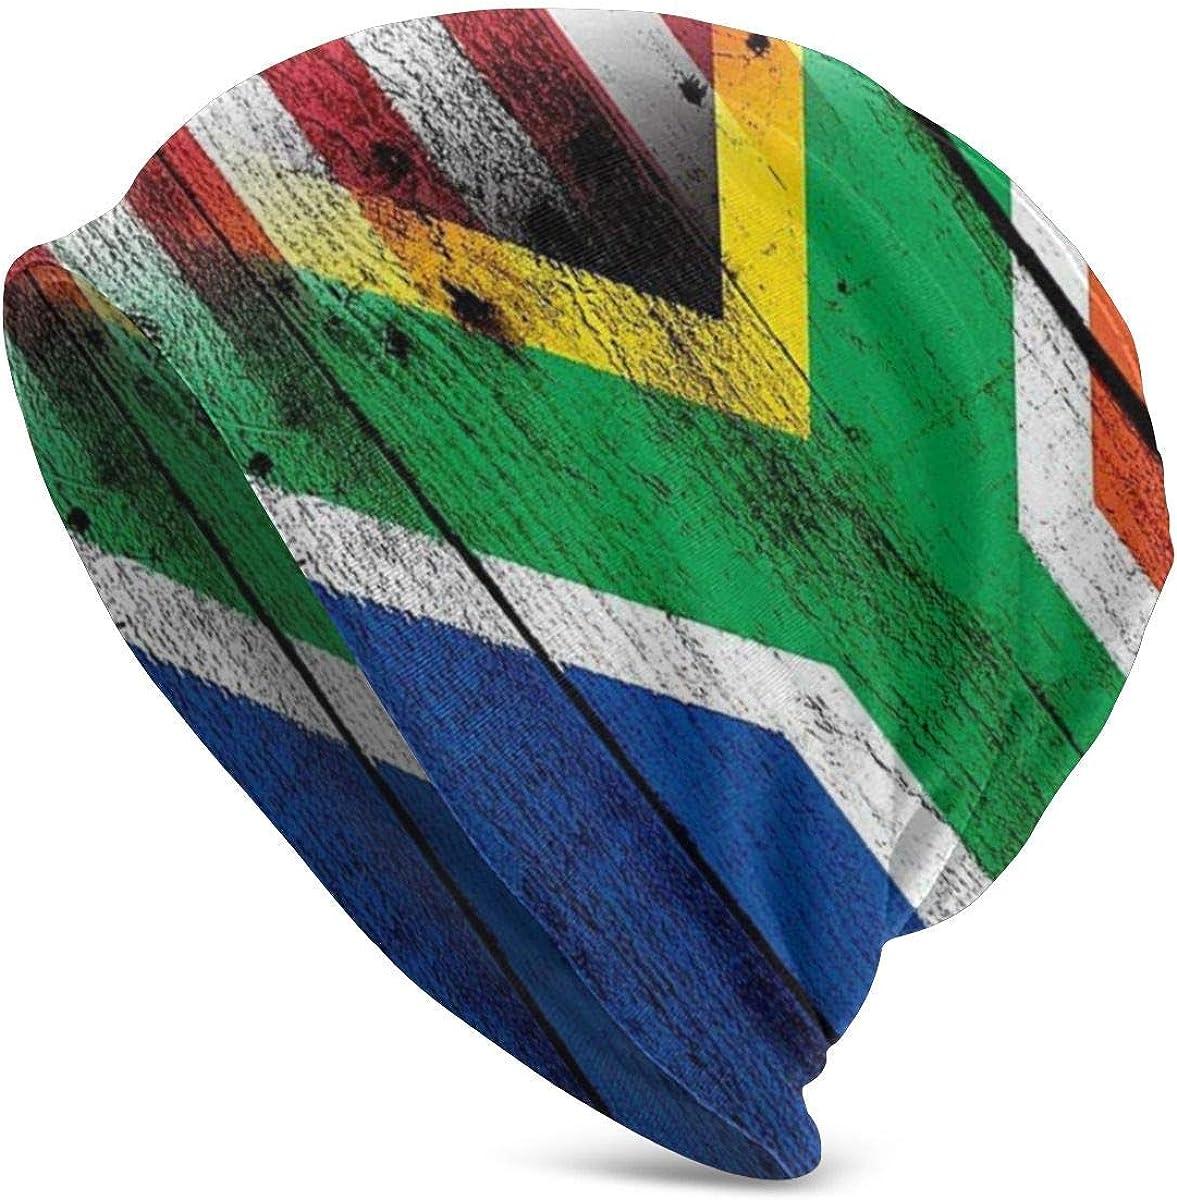 Knit Beanie Hat Bandera de Sudáfrica (Africana) Gorra de Calavera Americana Senderismo Hip Hop Warm Beanie Hat para Mujer Negro